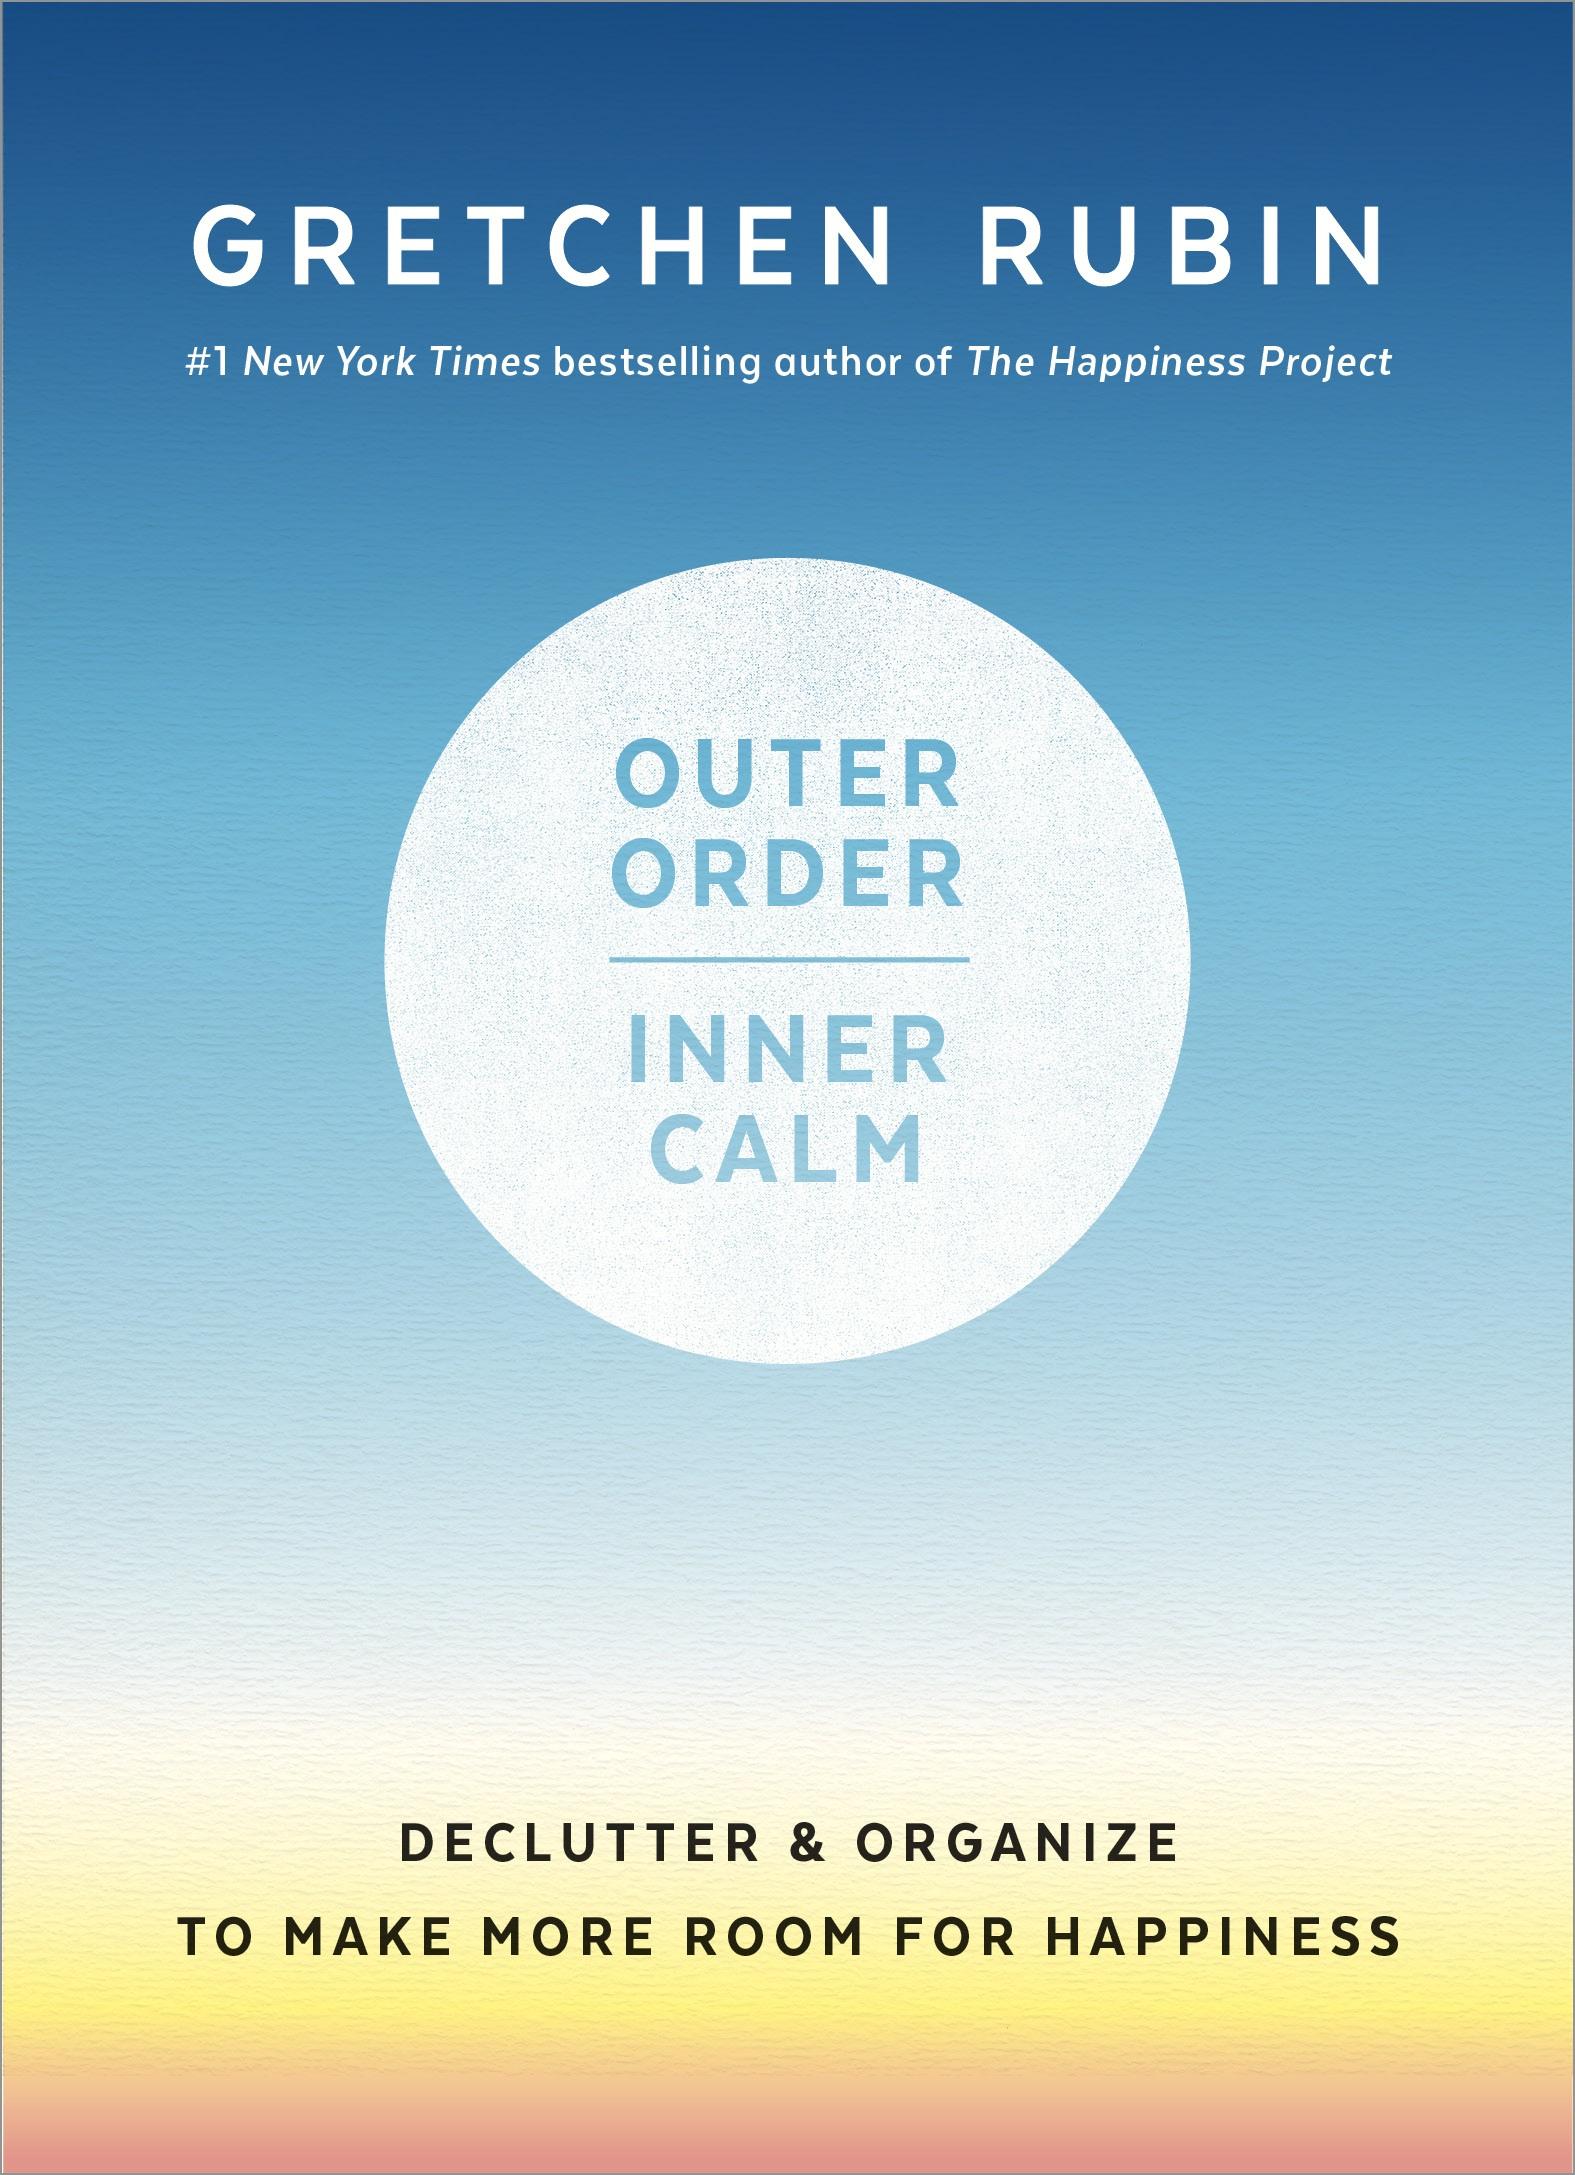 gretchen_rubin_book_outer_order_inner_calm